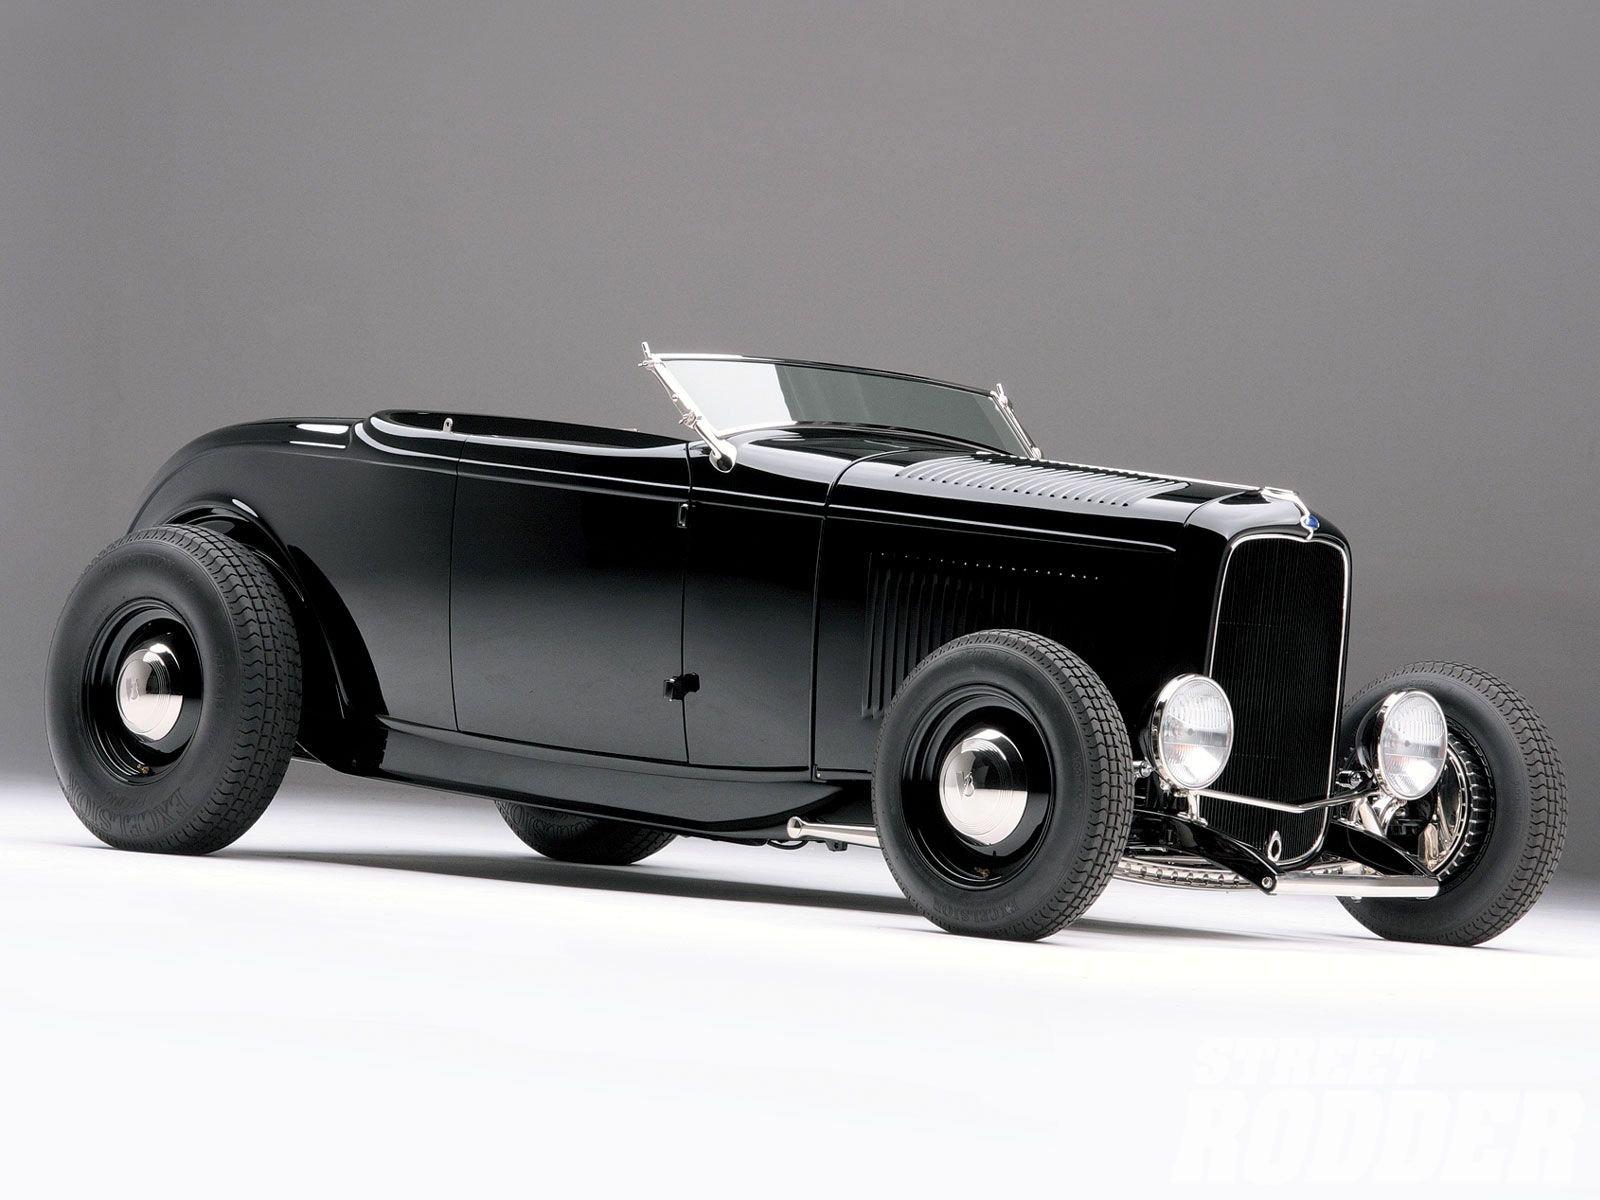 1932 Ford Roadster Hotrod Hot Rod Custom Old school USA 1600x1200 ...